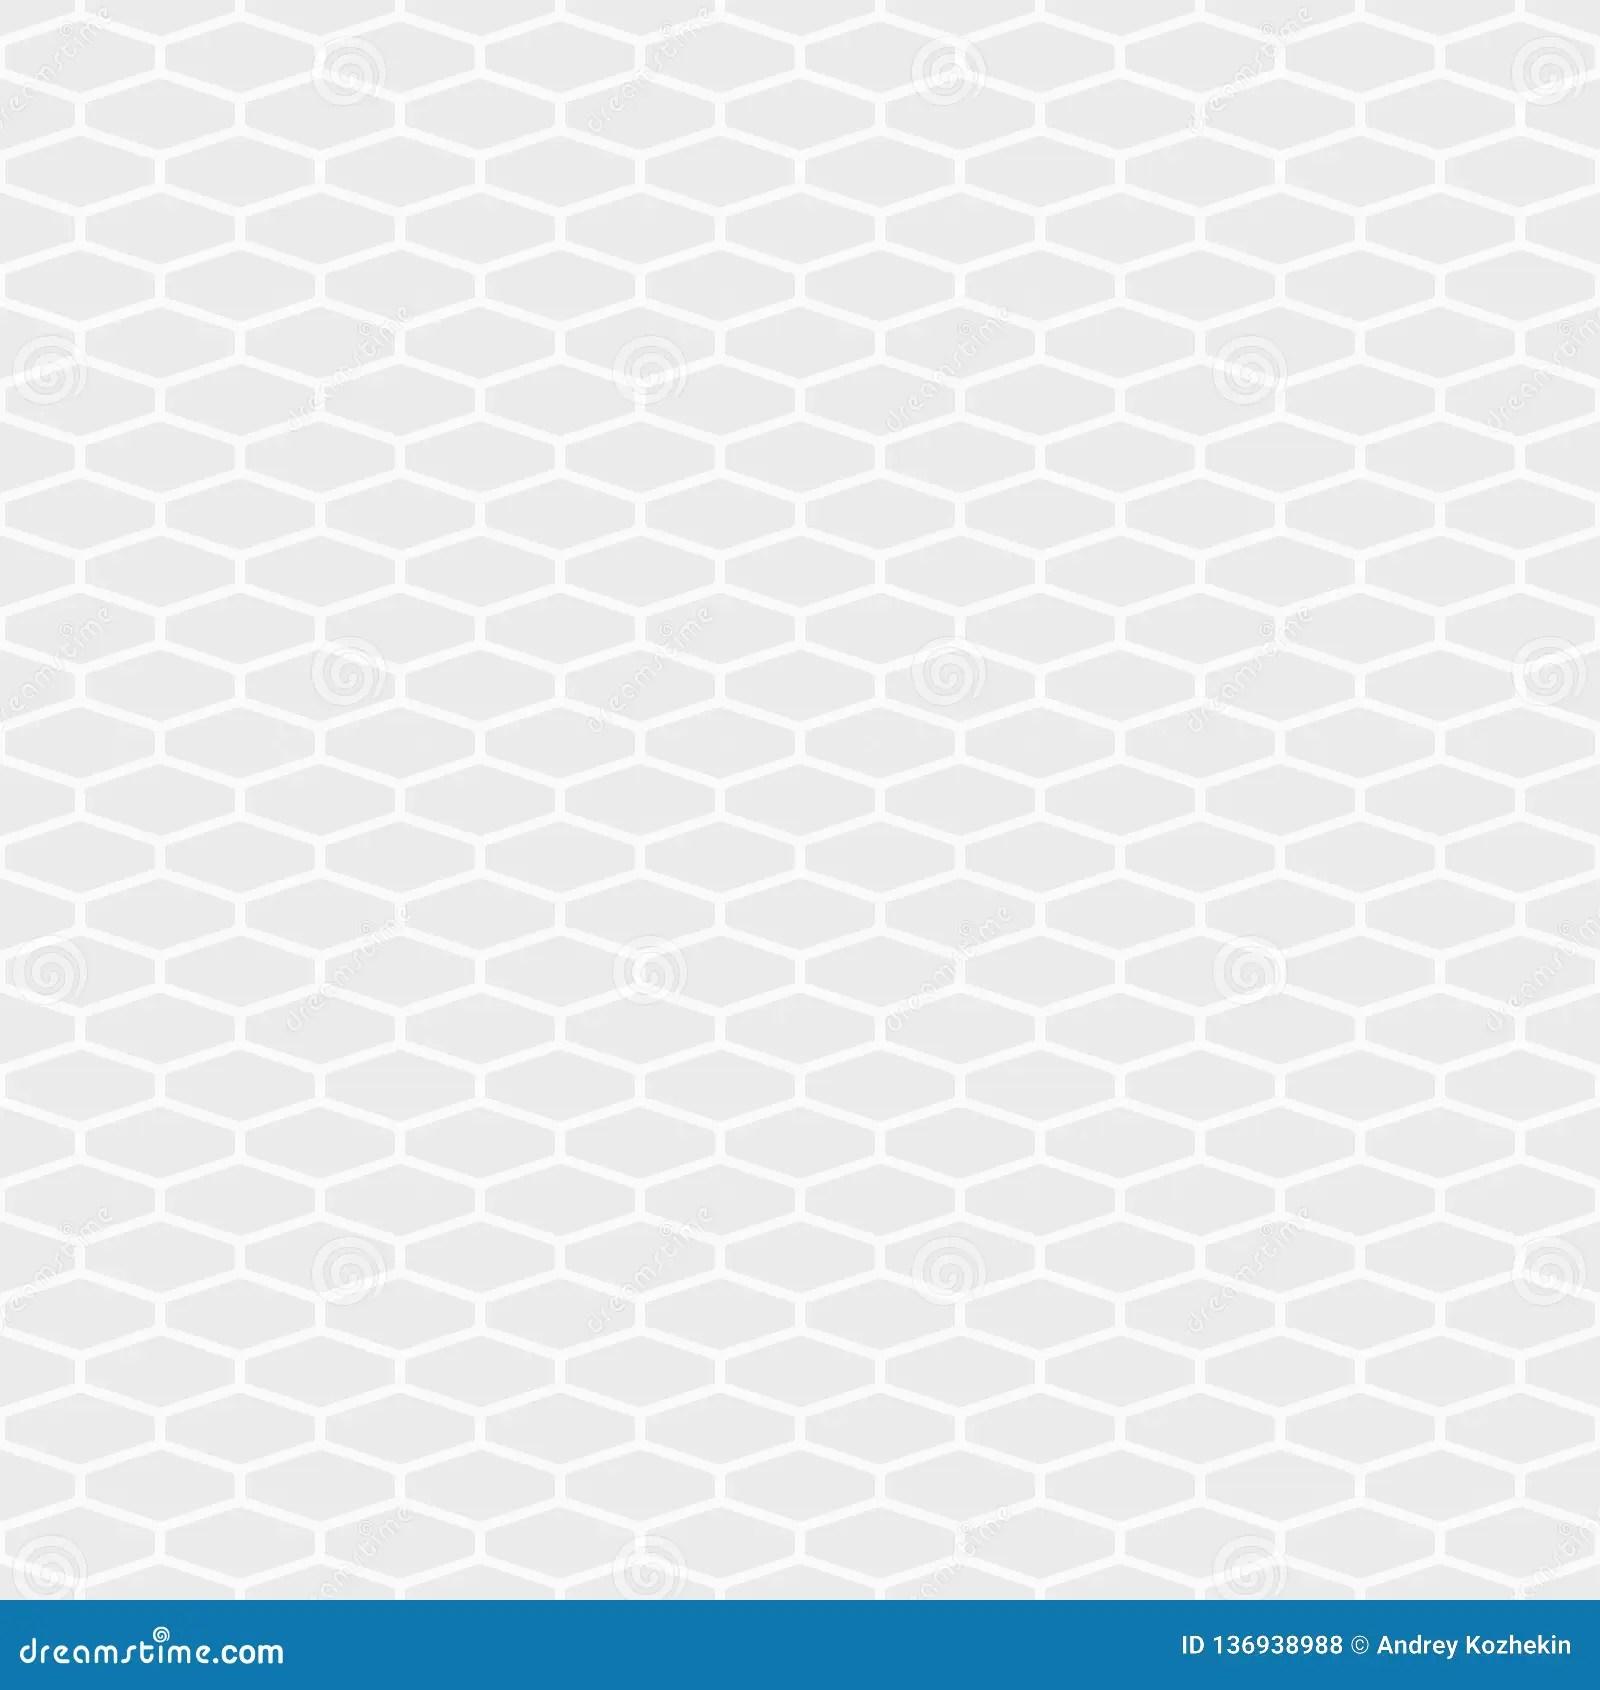 https www dreamstime com abstract seamless pattern elongated hexagon tiles white gray geometric texture hexagonal grid design wallpaper motif linear image136938988